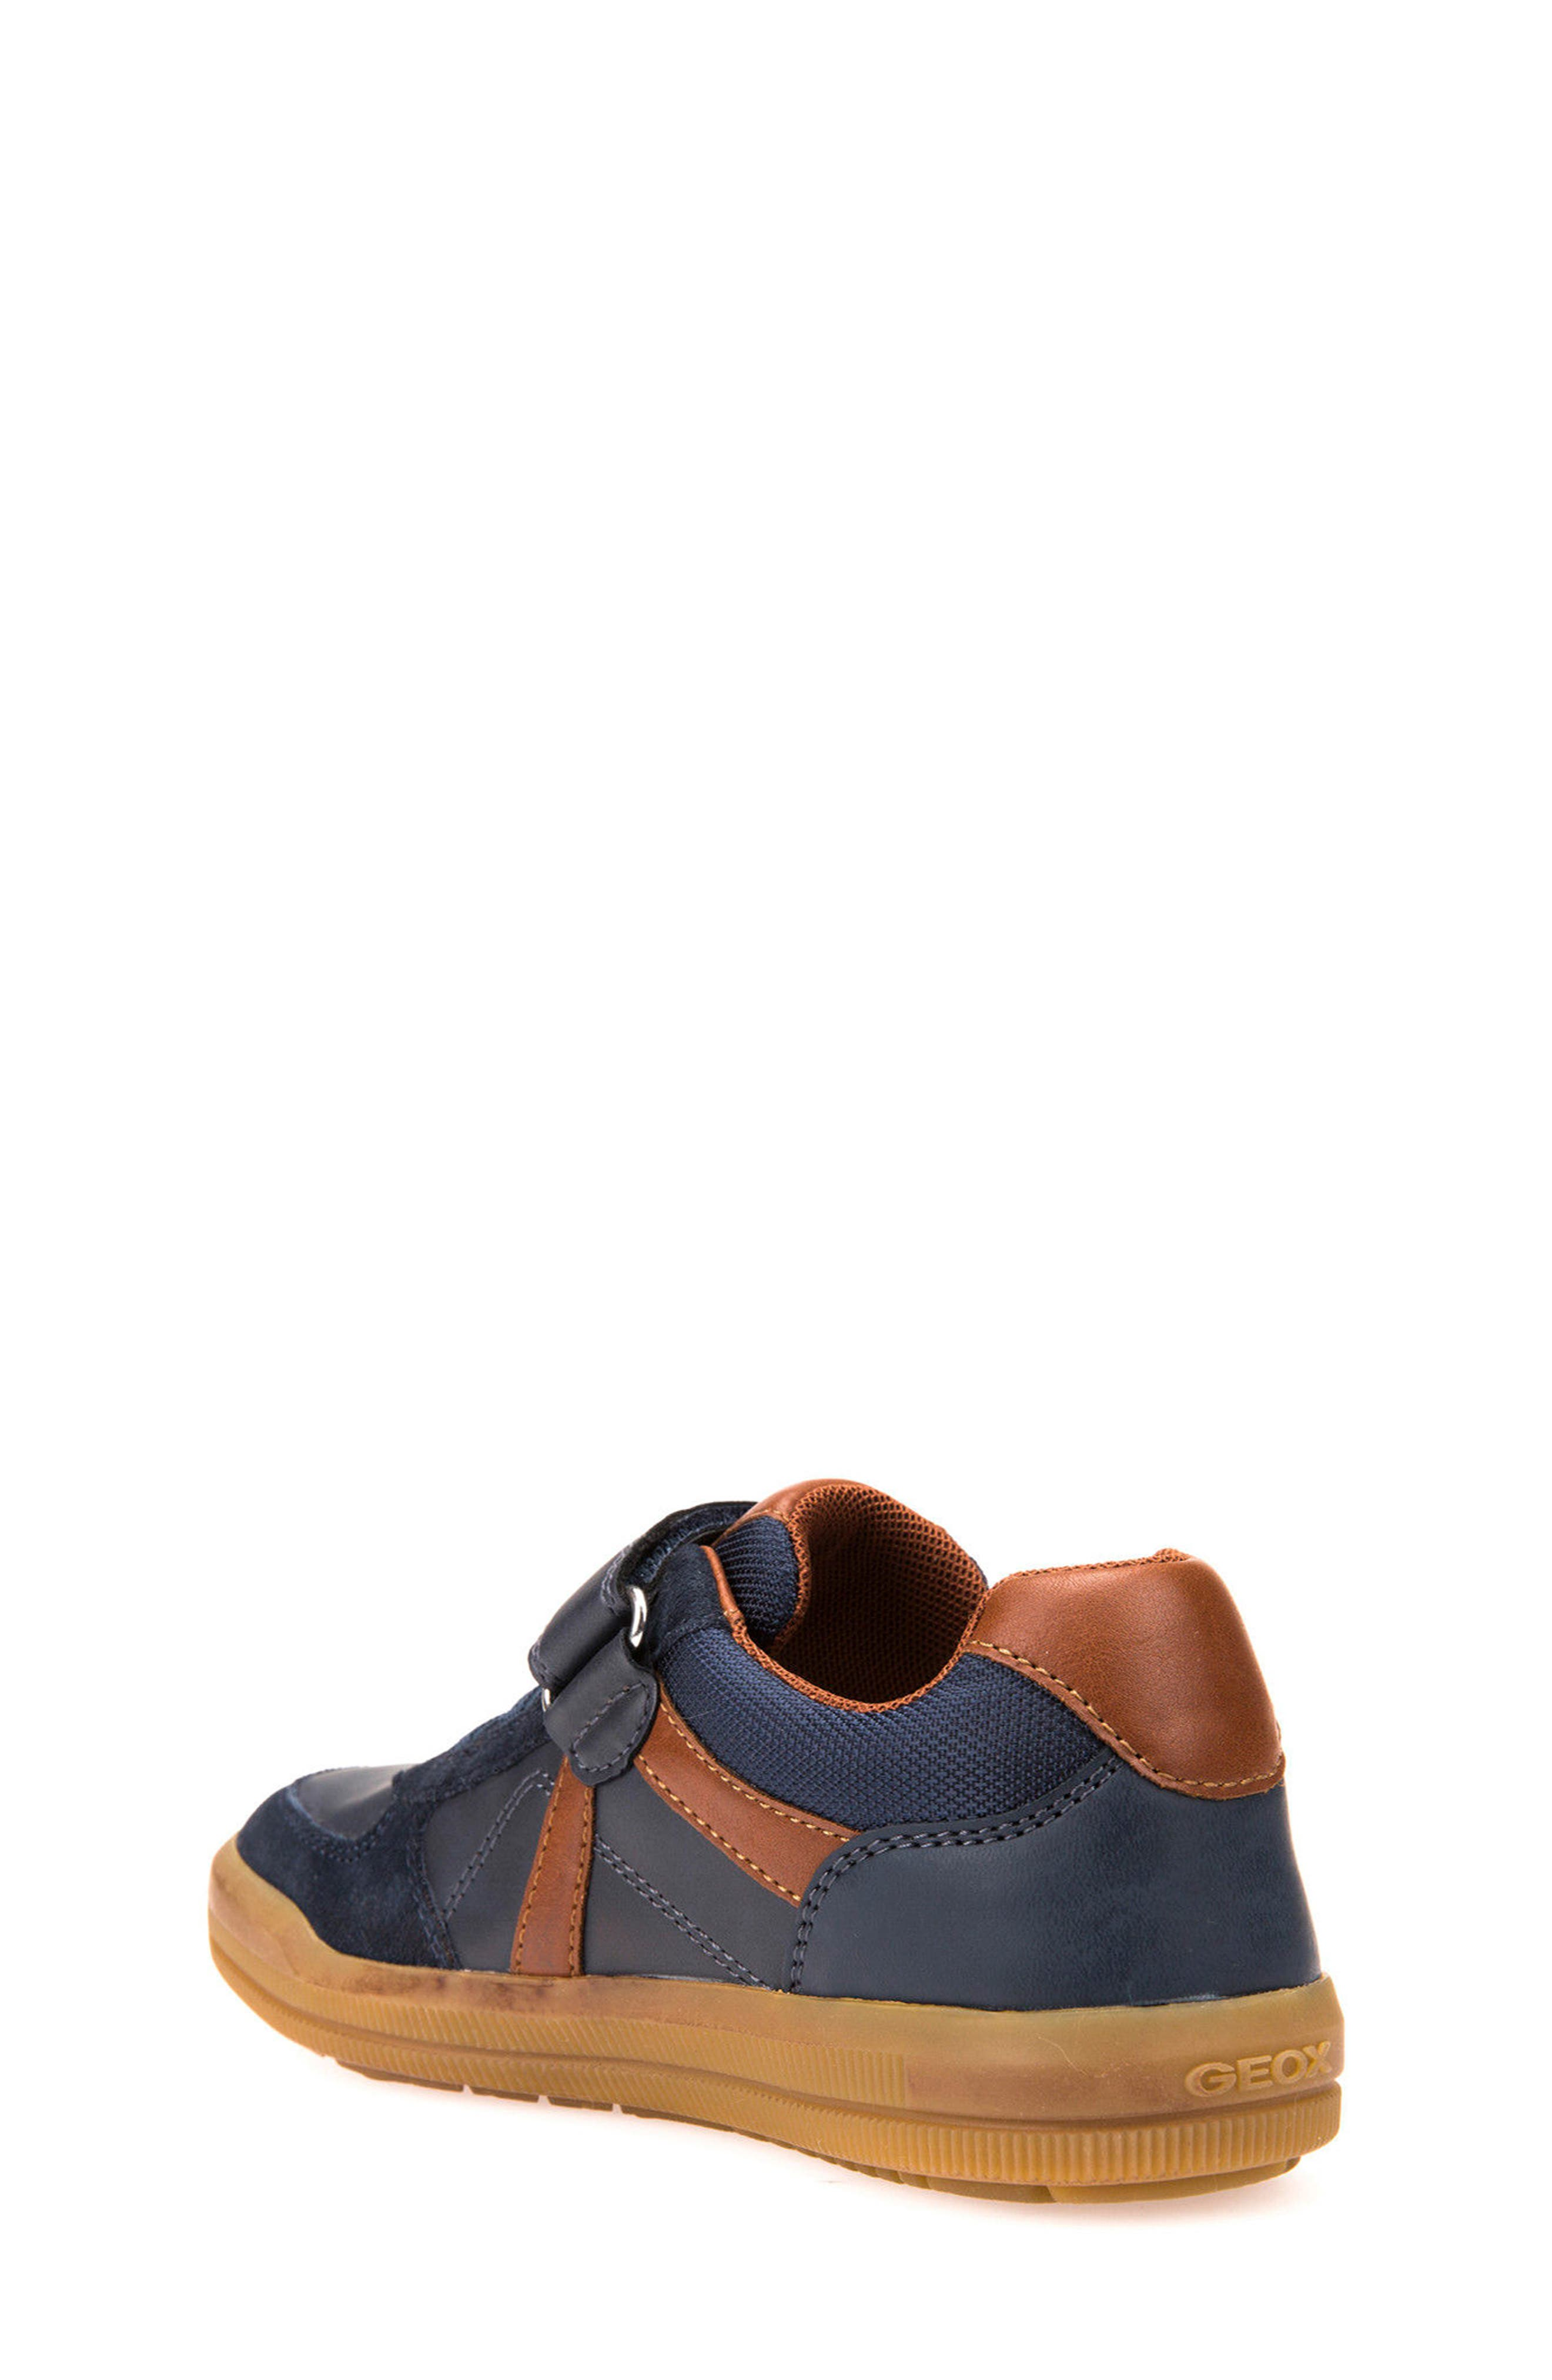 Alternate Image 2  - Geox Arzach Low Top Sneaker (Toddler, Little Kid & Big Kid)